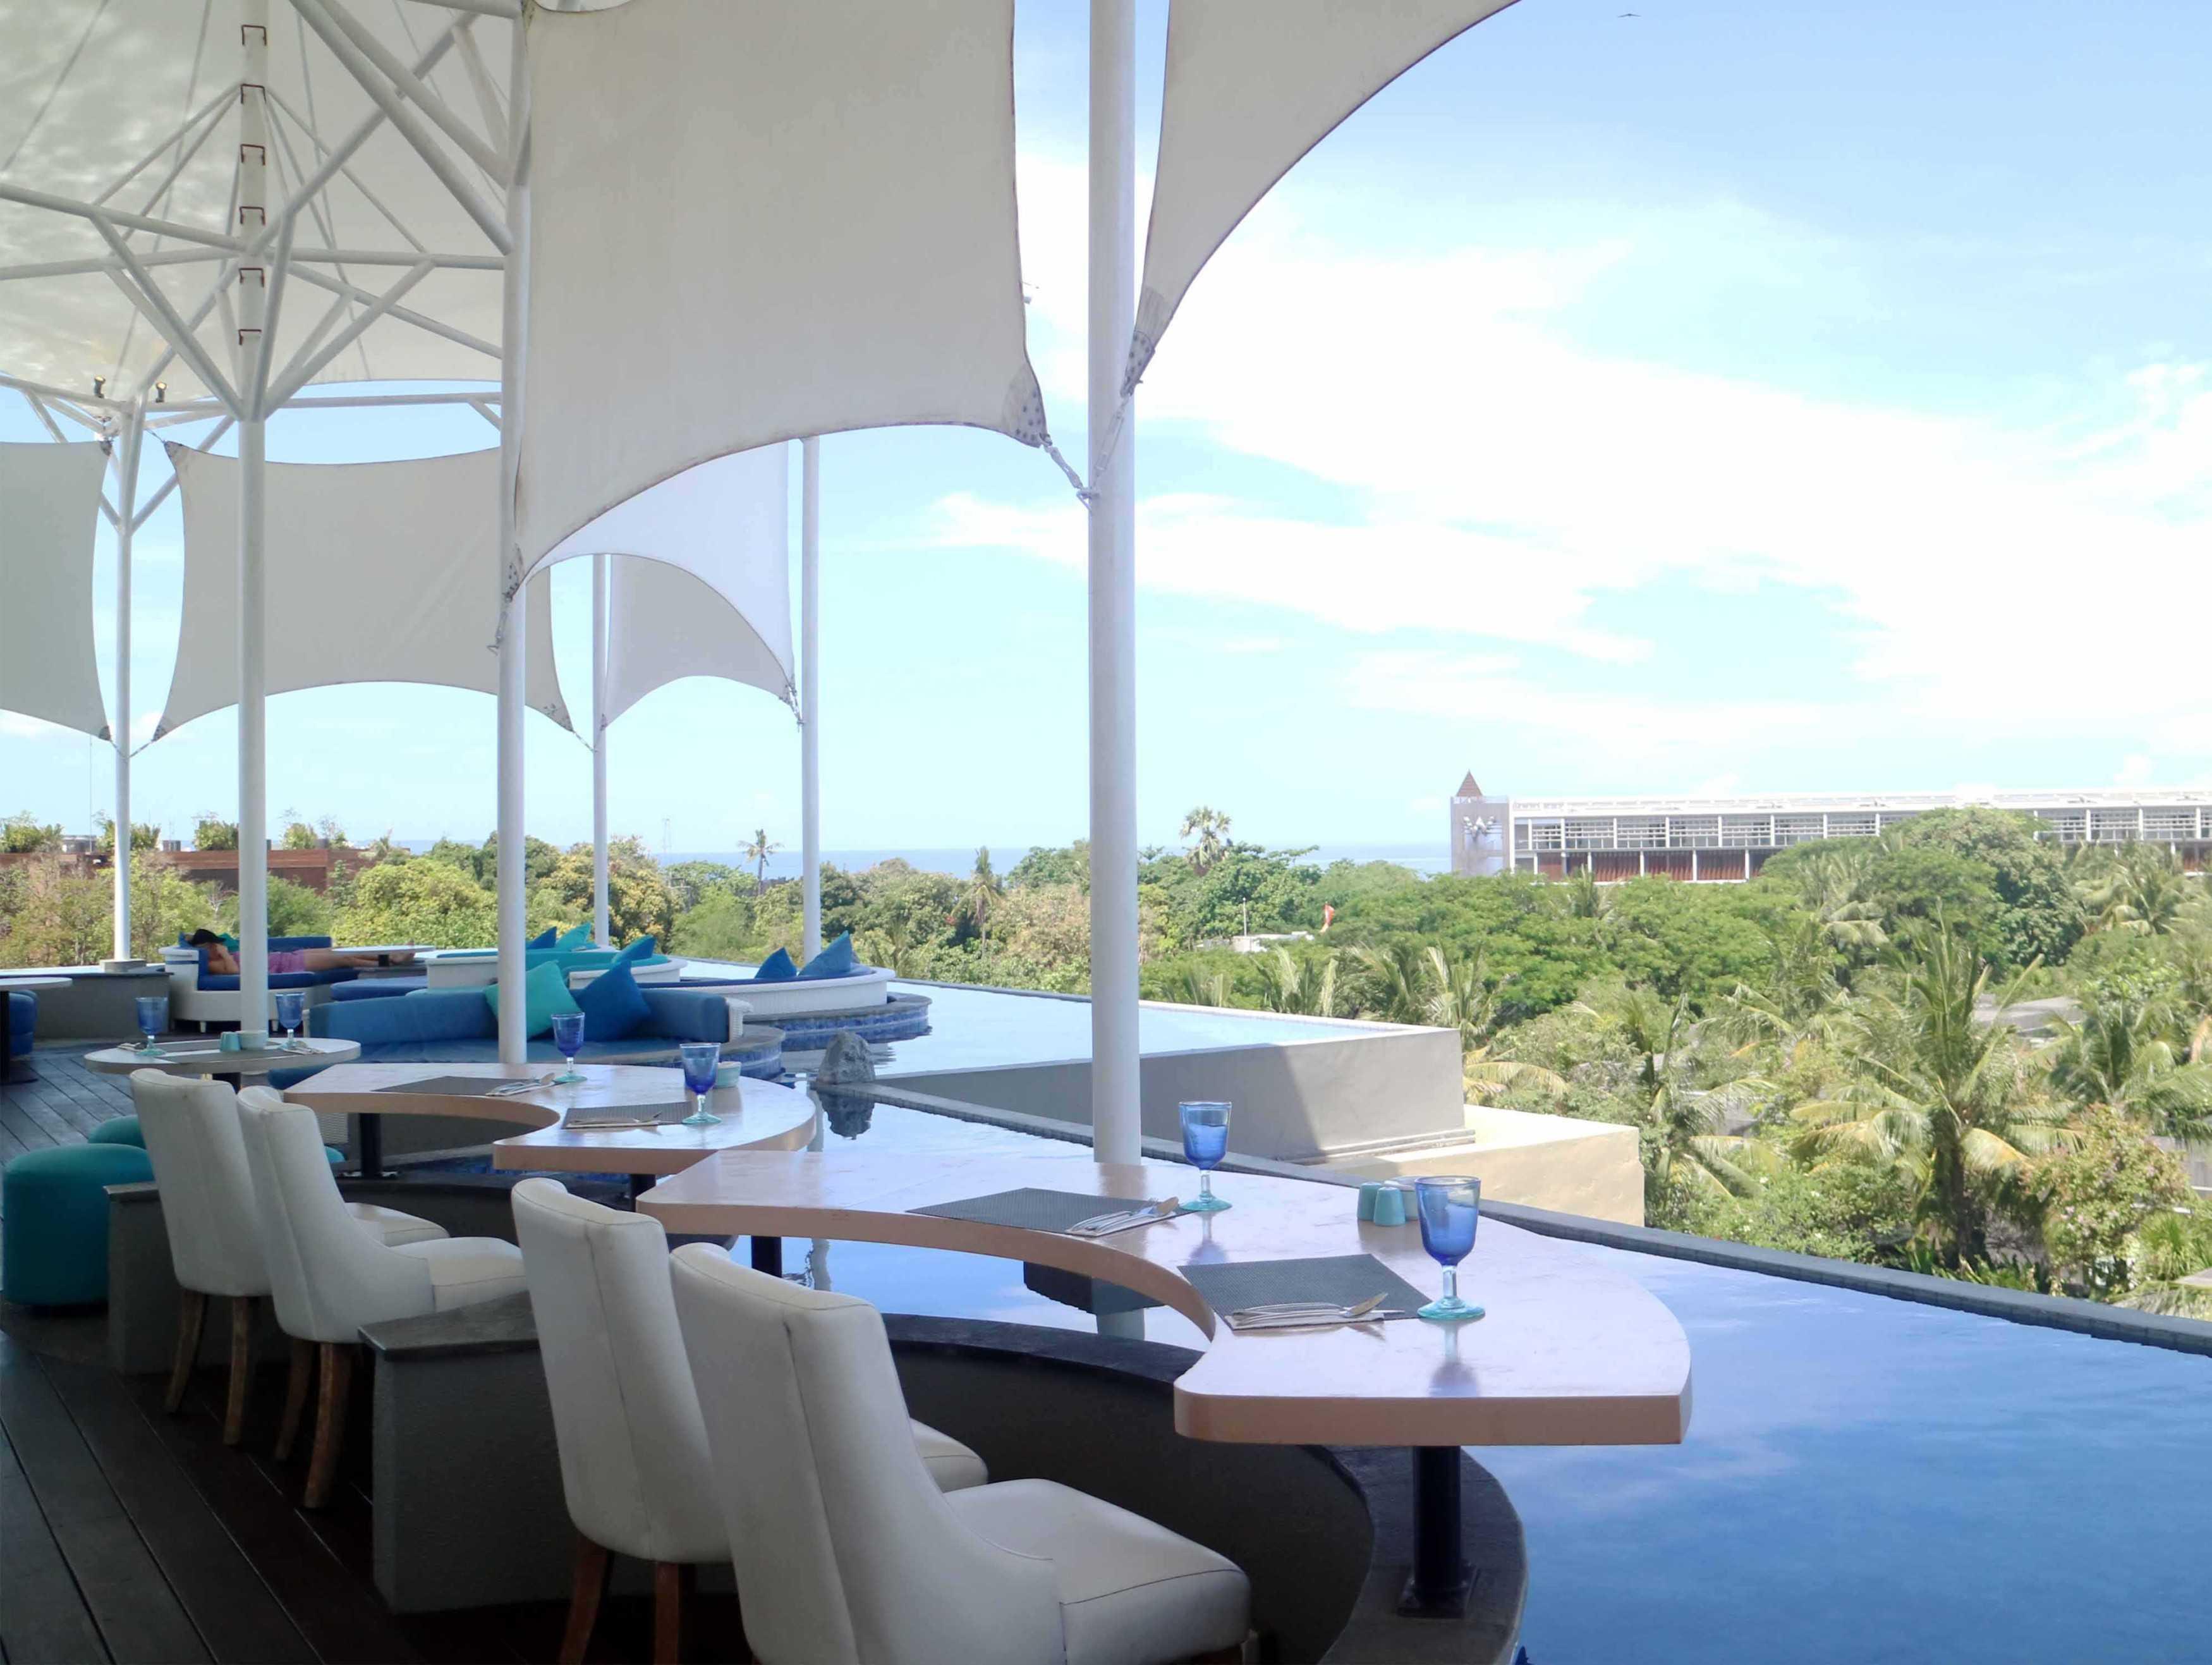 Monokroma Architect Golden Tulip Devinz Skyvilla Seminyak, Bali Seminyak, Bali Rooftop Restaurant Modern  29943